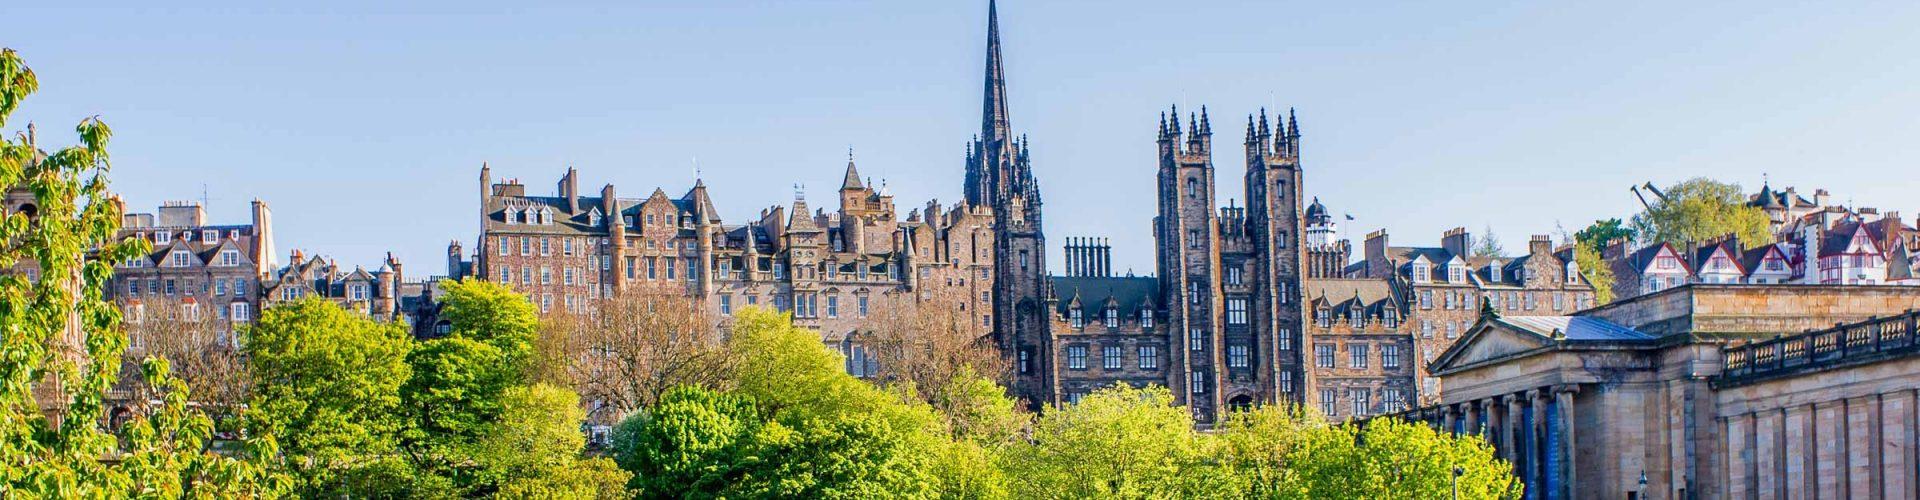 View of Edinburgh buildings from Princes Street Gardens